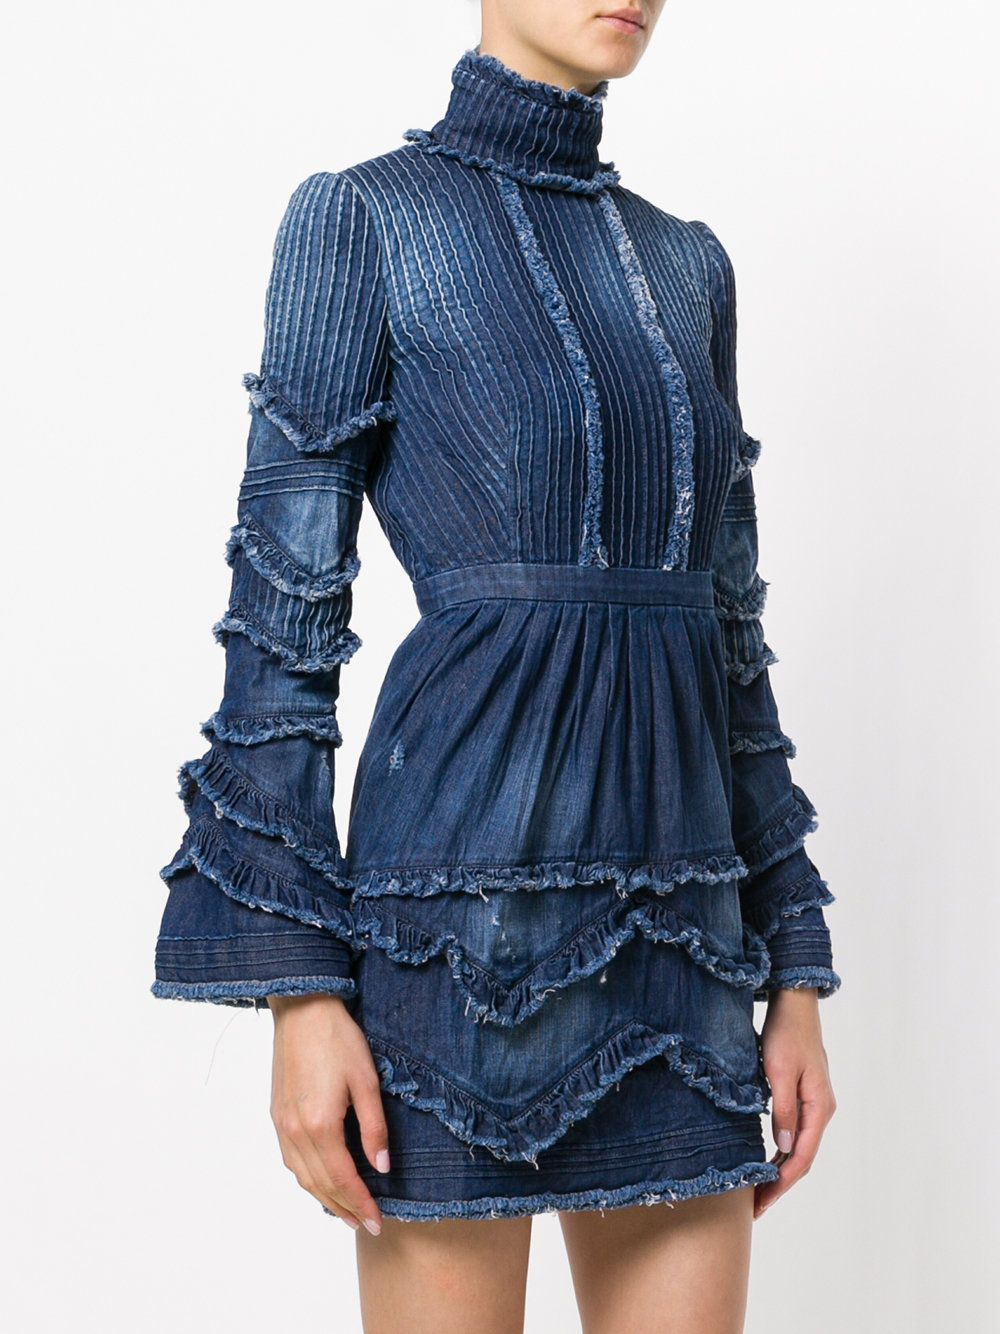 Dsquared2 Ruffled Denim Dress Denim Ruffle Dress Denim Fashion Denim Inspiration [ 1334 x 1000 Pixel ]